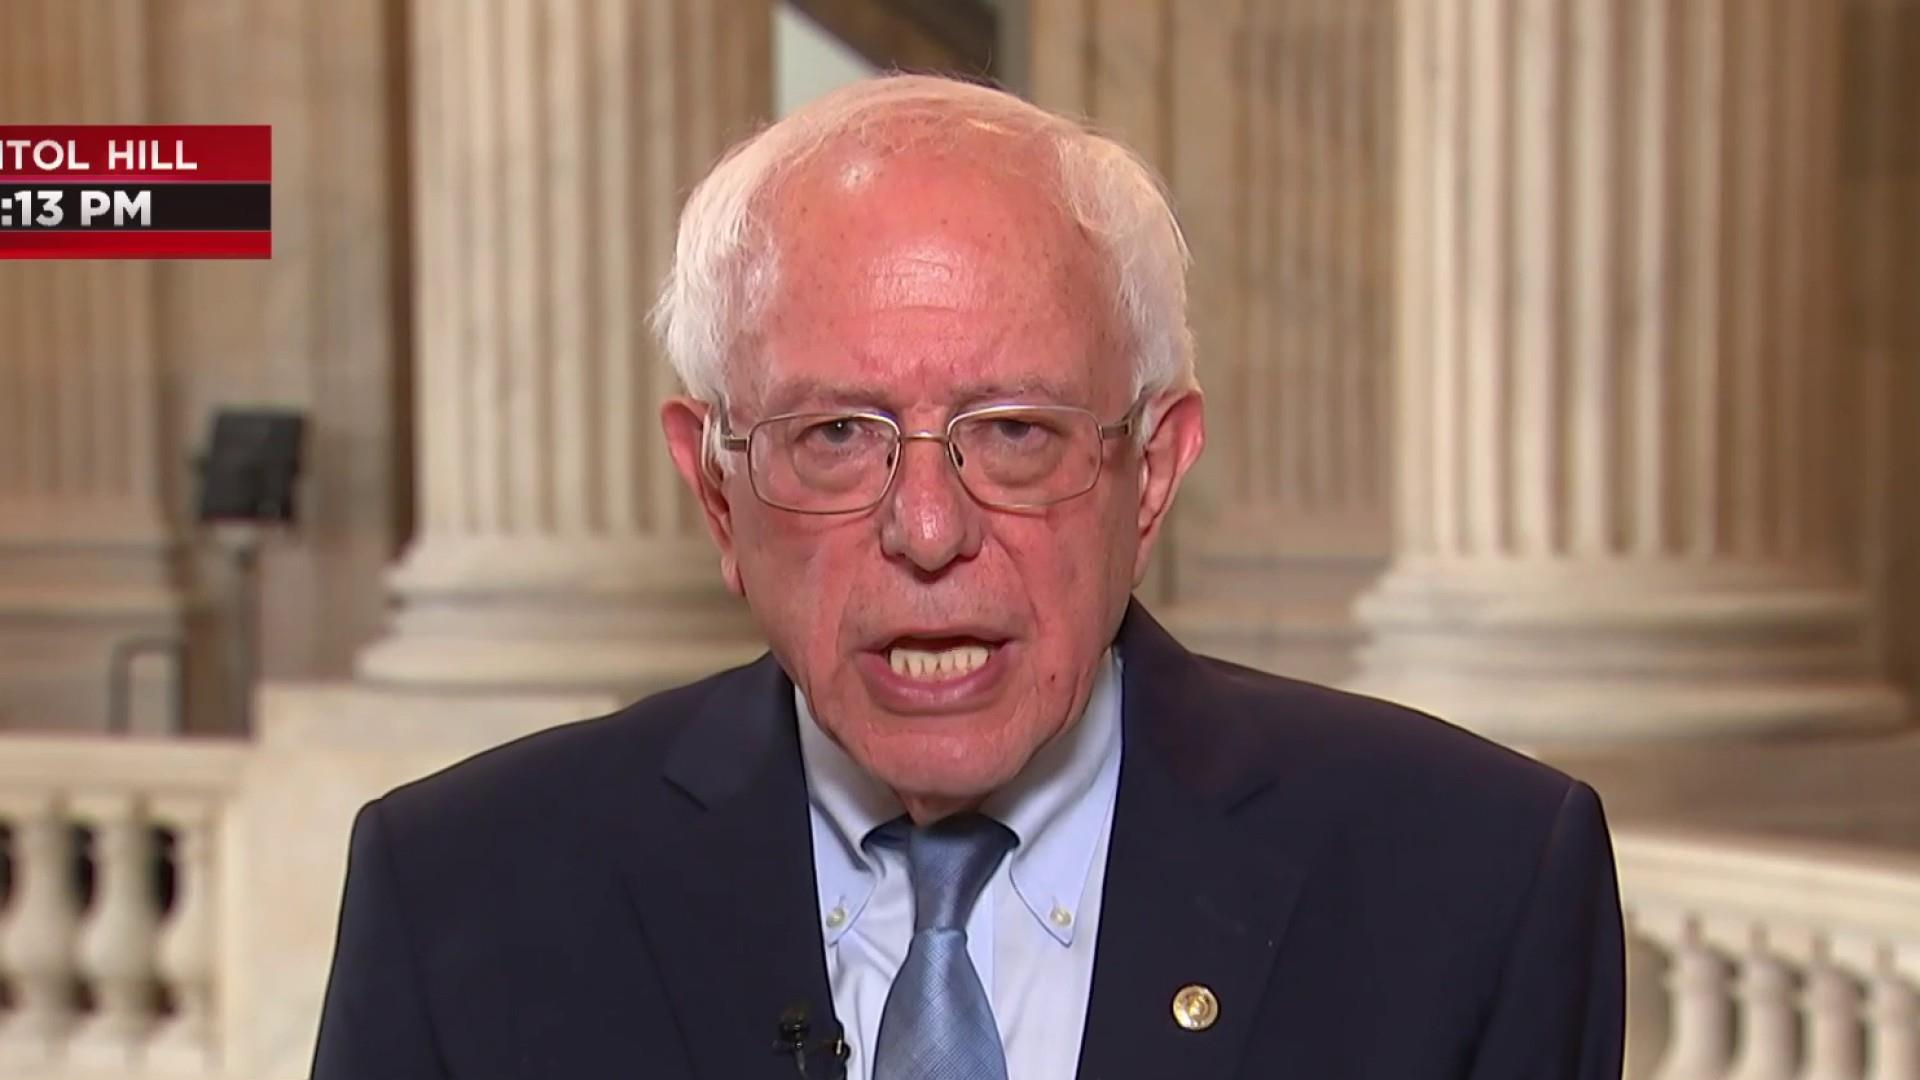 Sen. Bernie Sanders talks 2020 race, escalating tensions with Iran